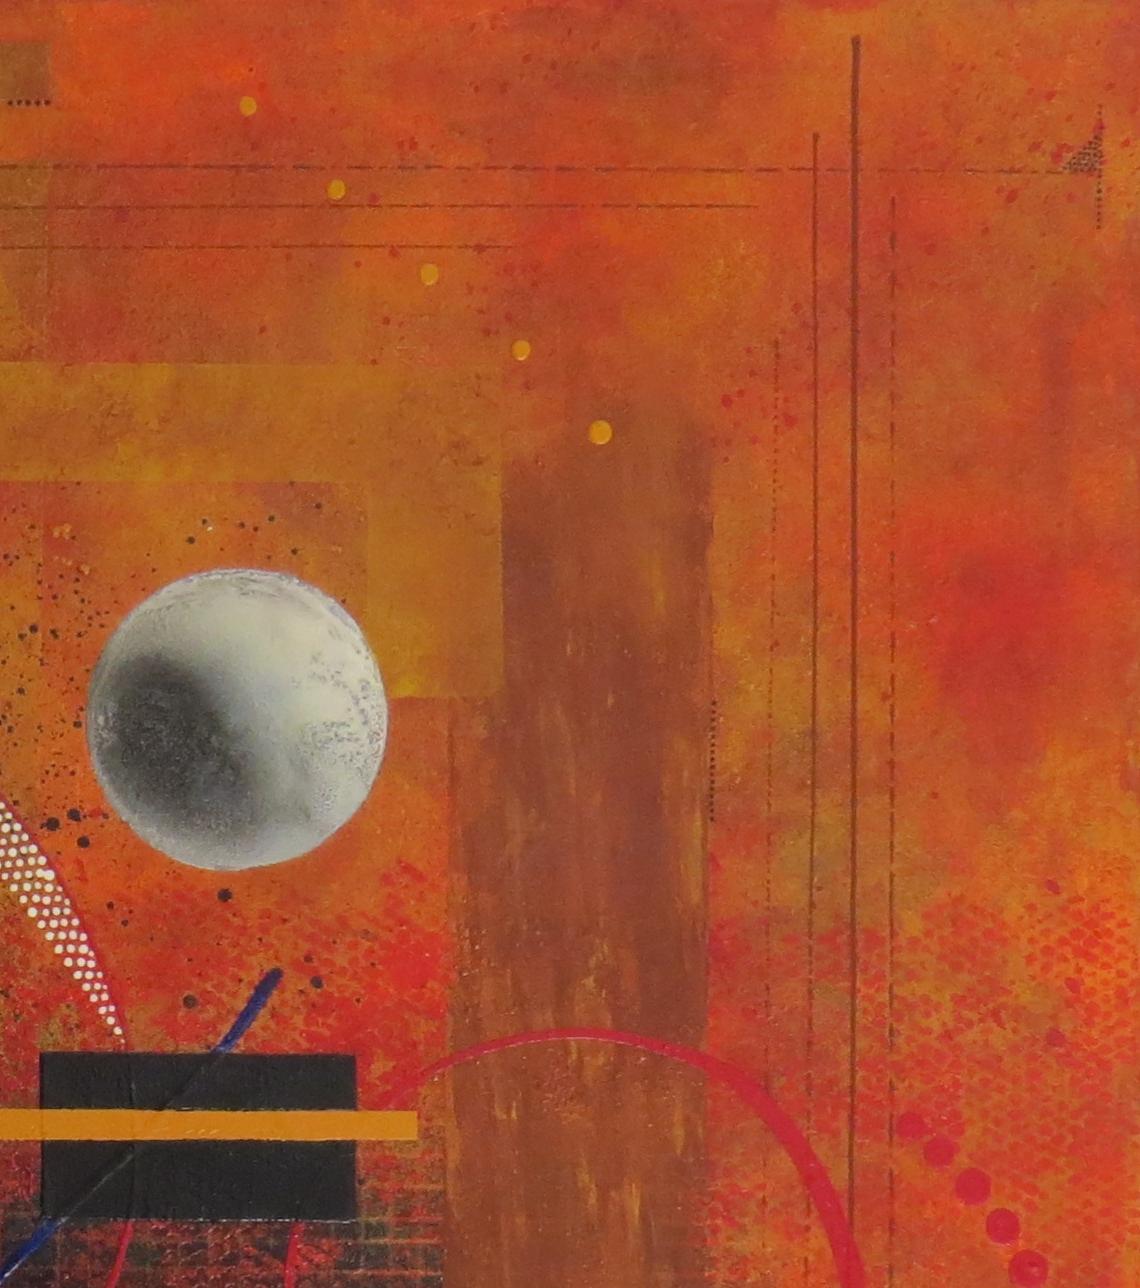 dzëta - vue zoom4 - DALUZ GALEGO - peinture abstraite